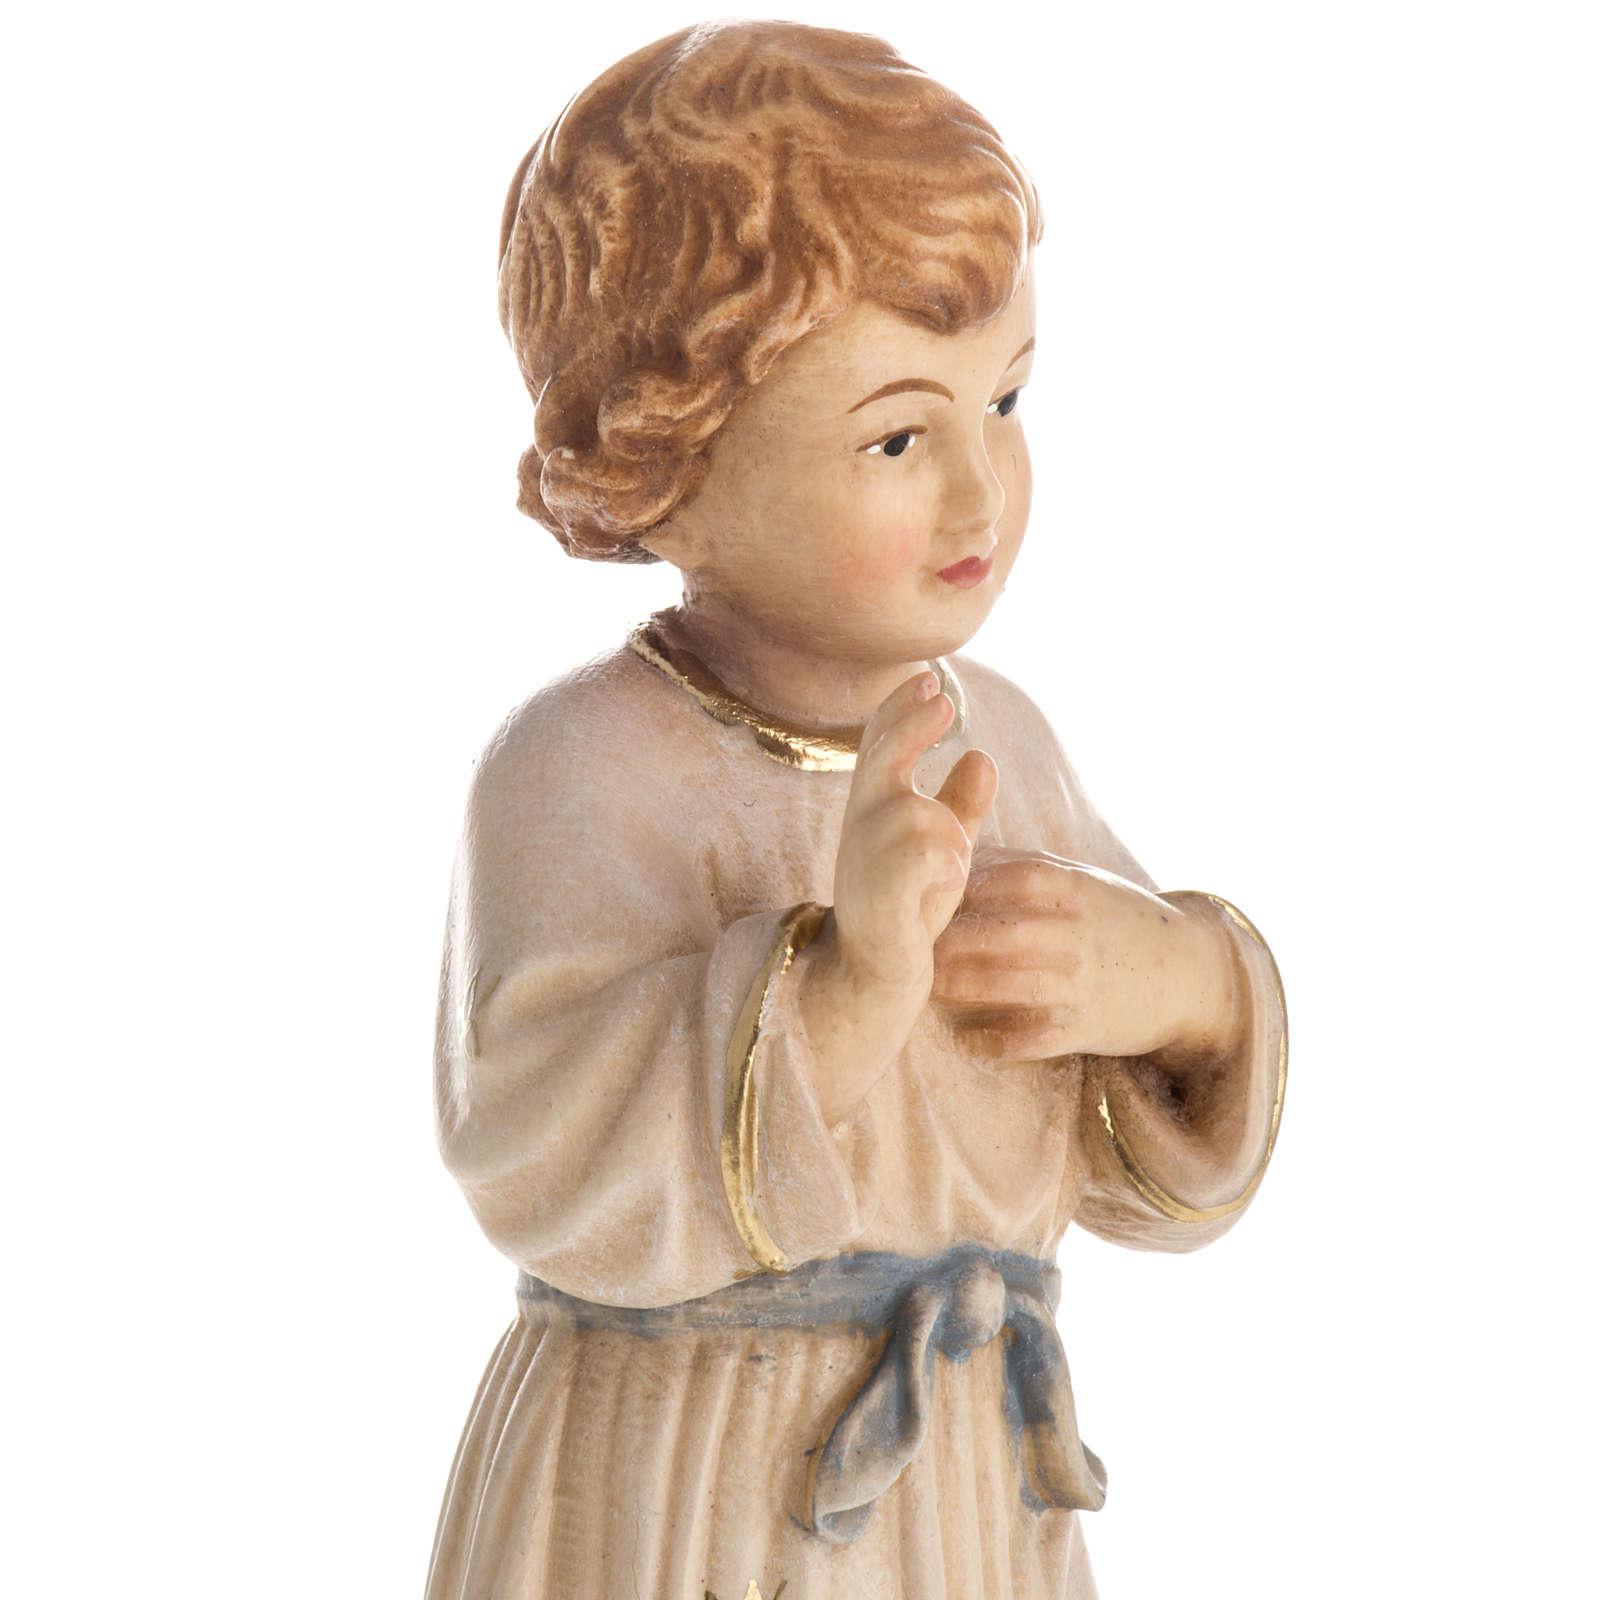 Adolescent Jesus wooden statue painted 4